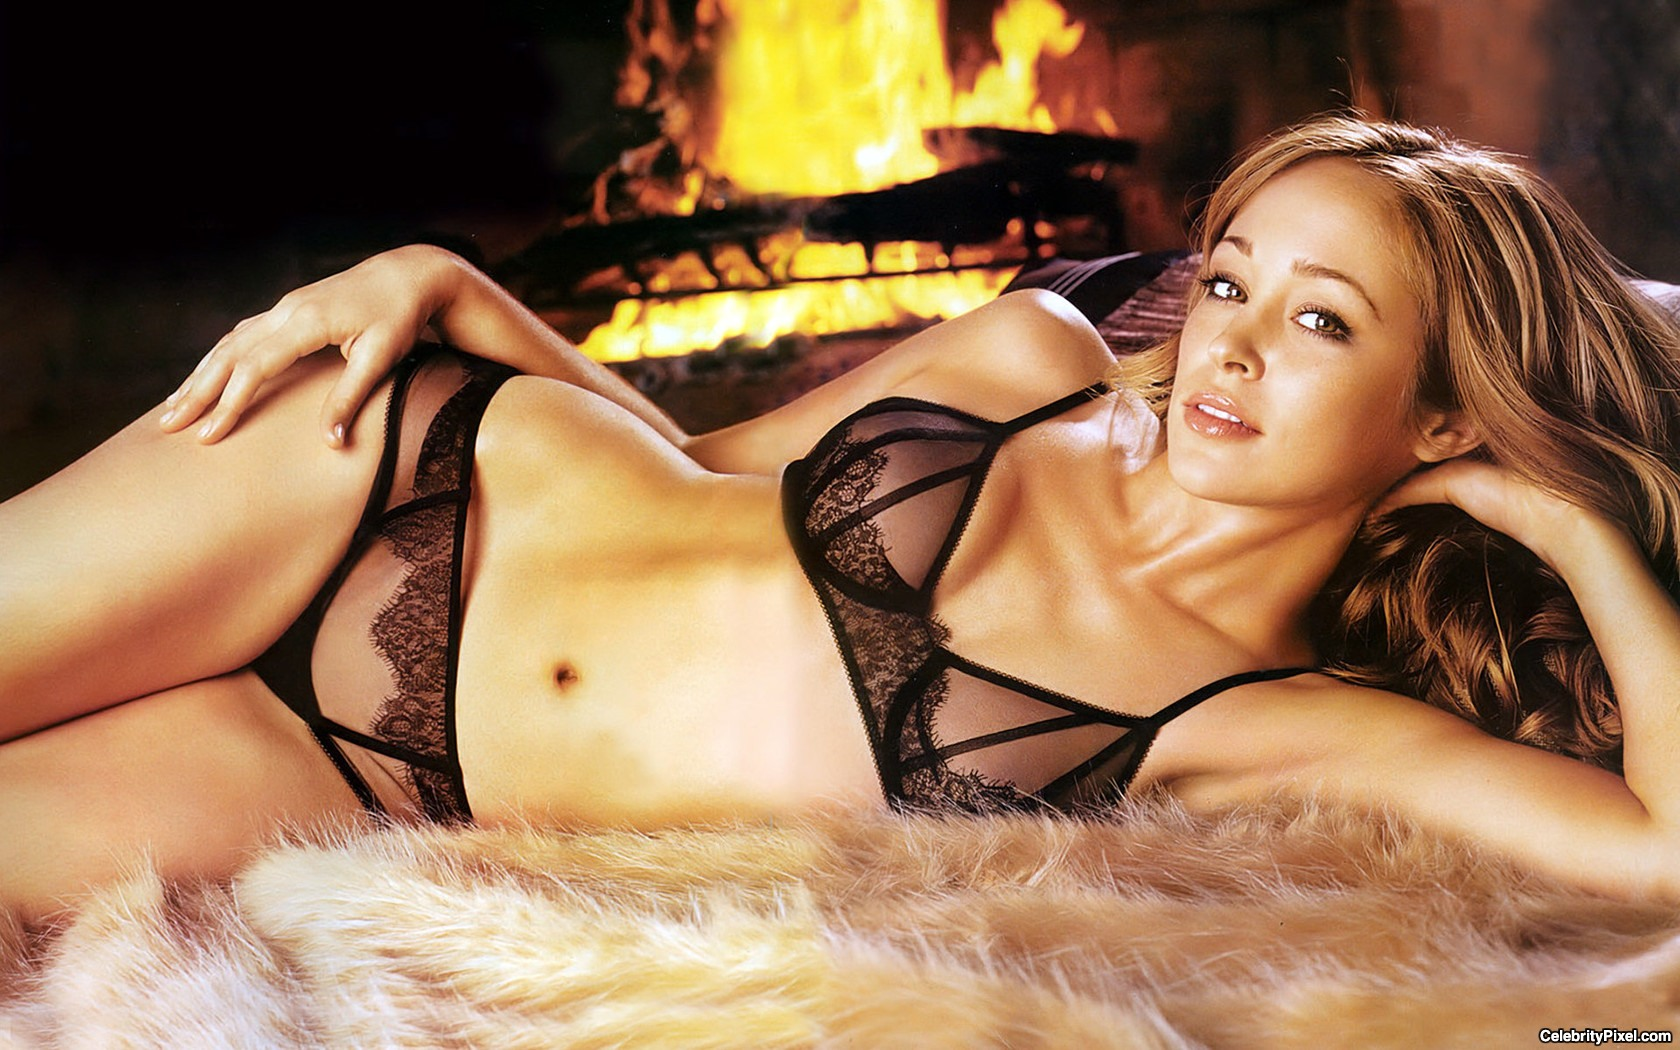 Autumn Reeser en lingerie transparente